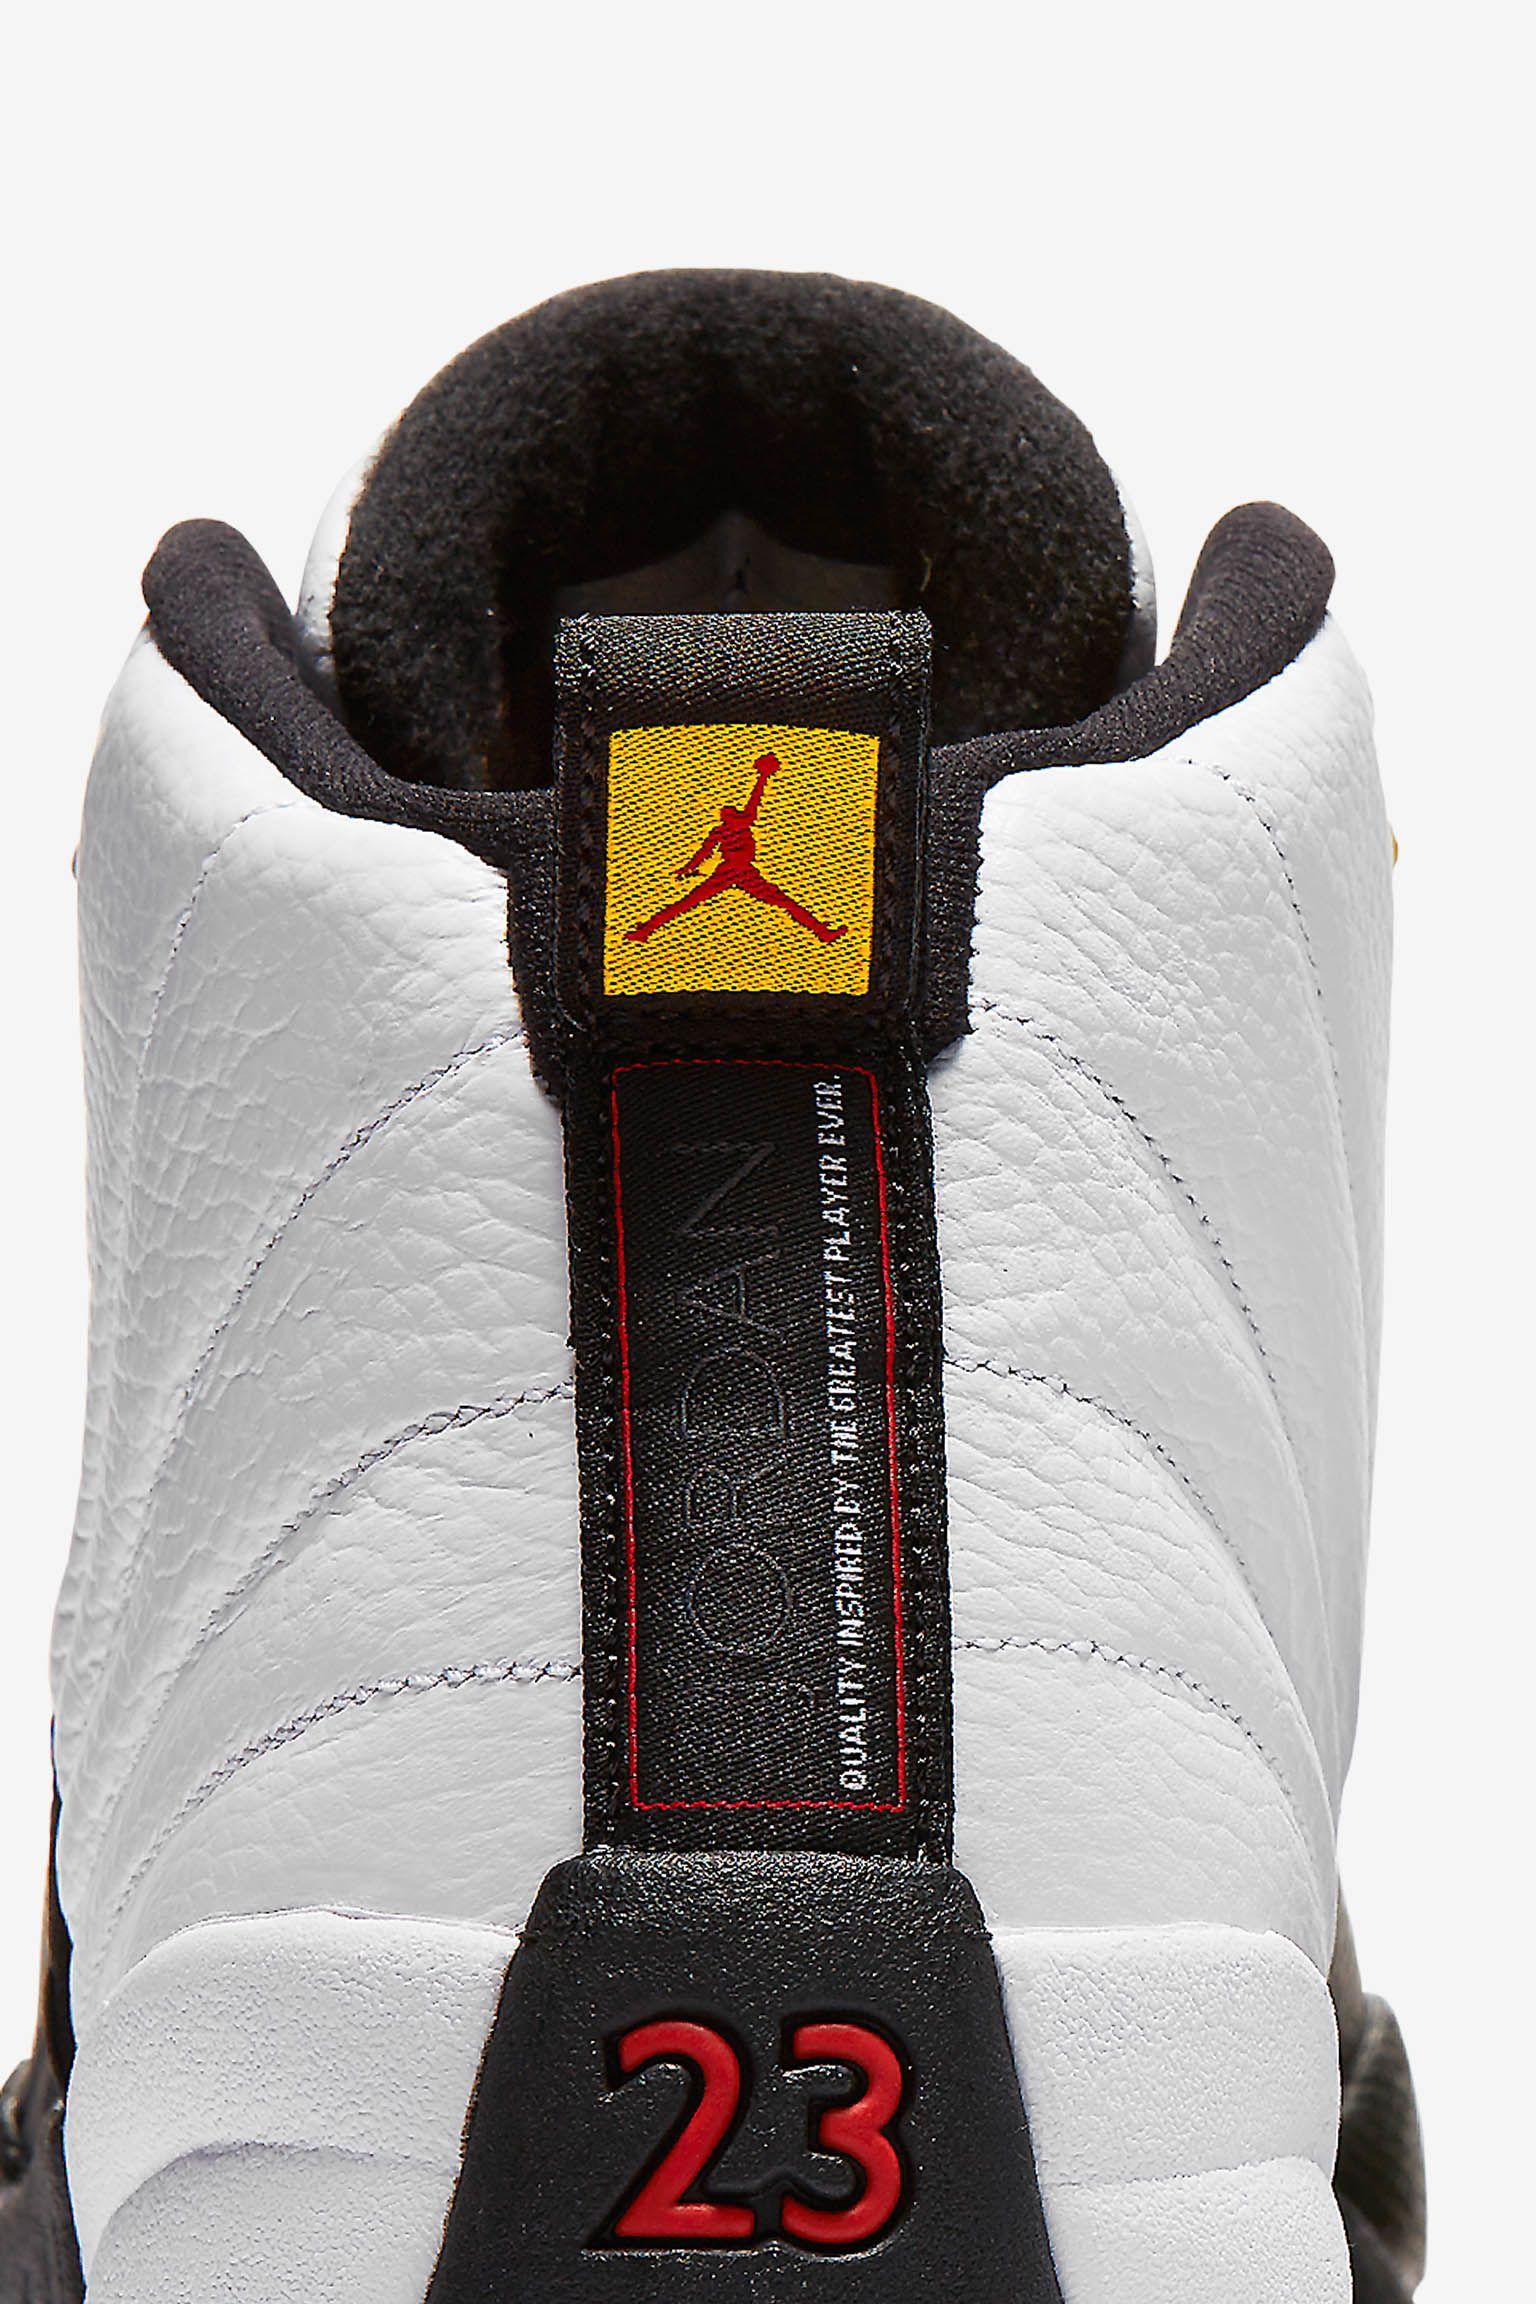 Air Jordan 12 Retro 'Taxi'. Release Date